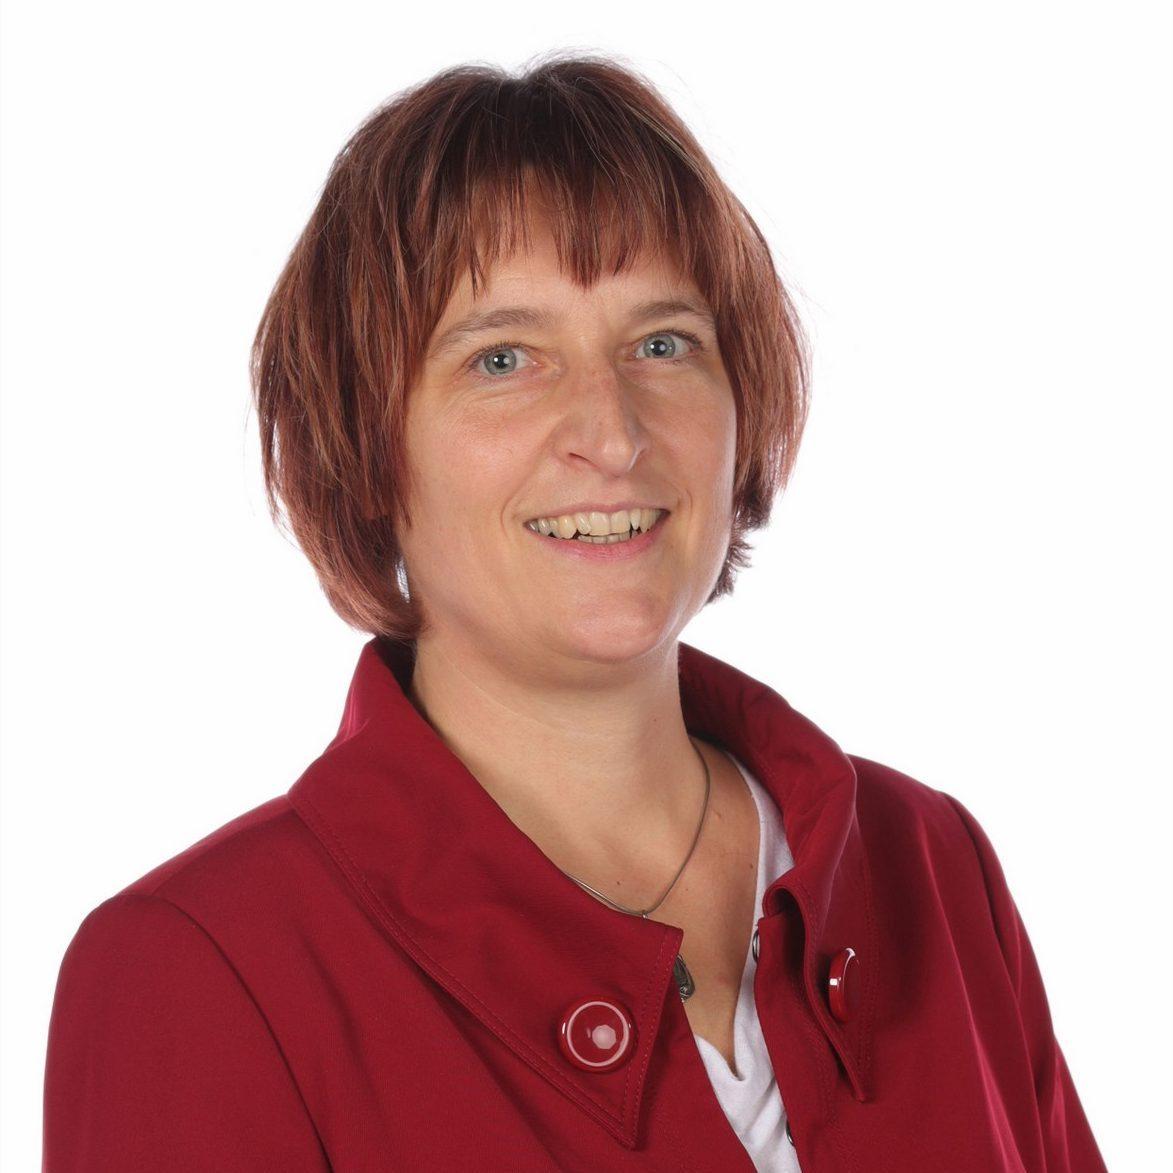 Natalie Rokyta-Bräu